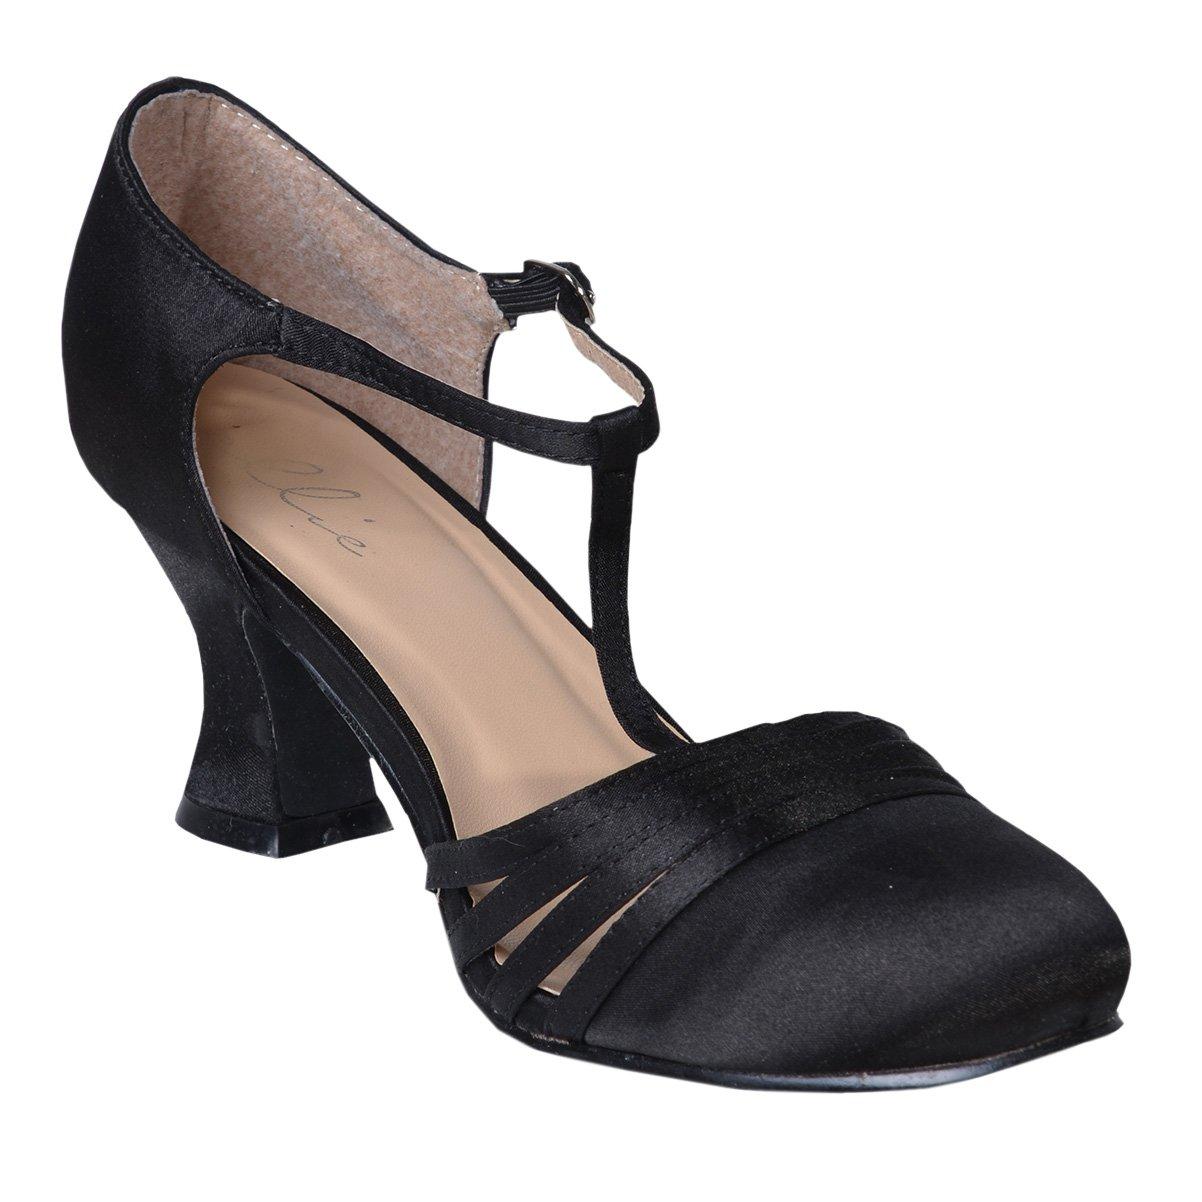 1920s Flapper Dresses, 20s Costumes in Australia Womens Sexy Black Shoes 2.5 Inch Heel Satin Dance Shoe Flapper Costume 1920s AUD 50.28 AT vintagedancer.com